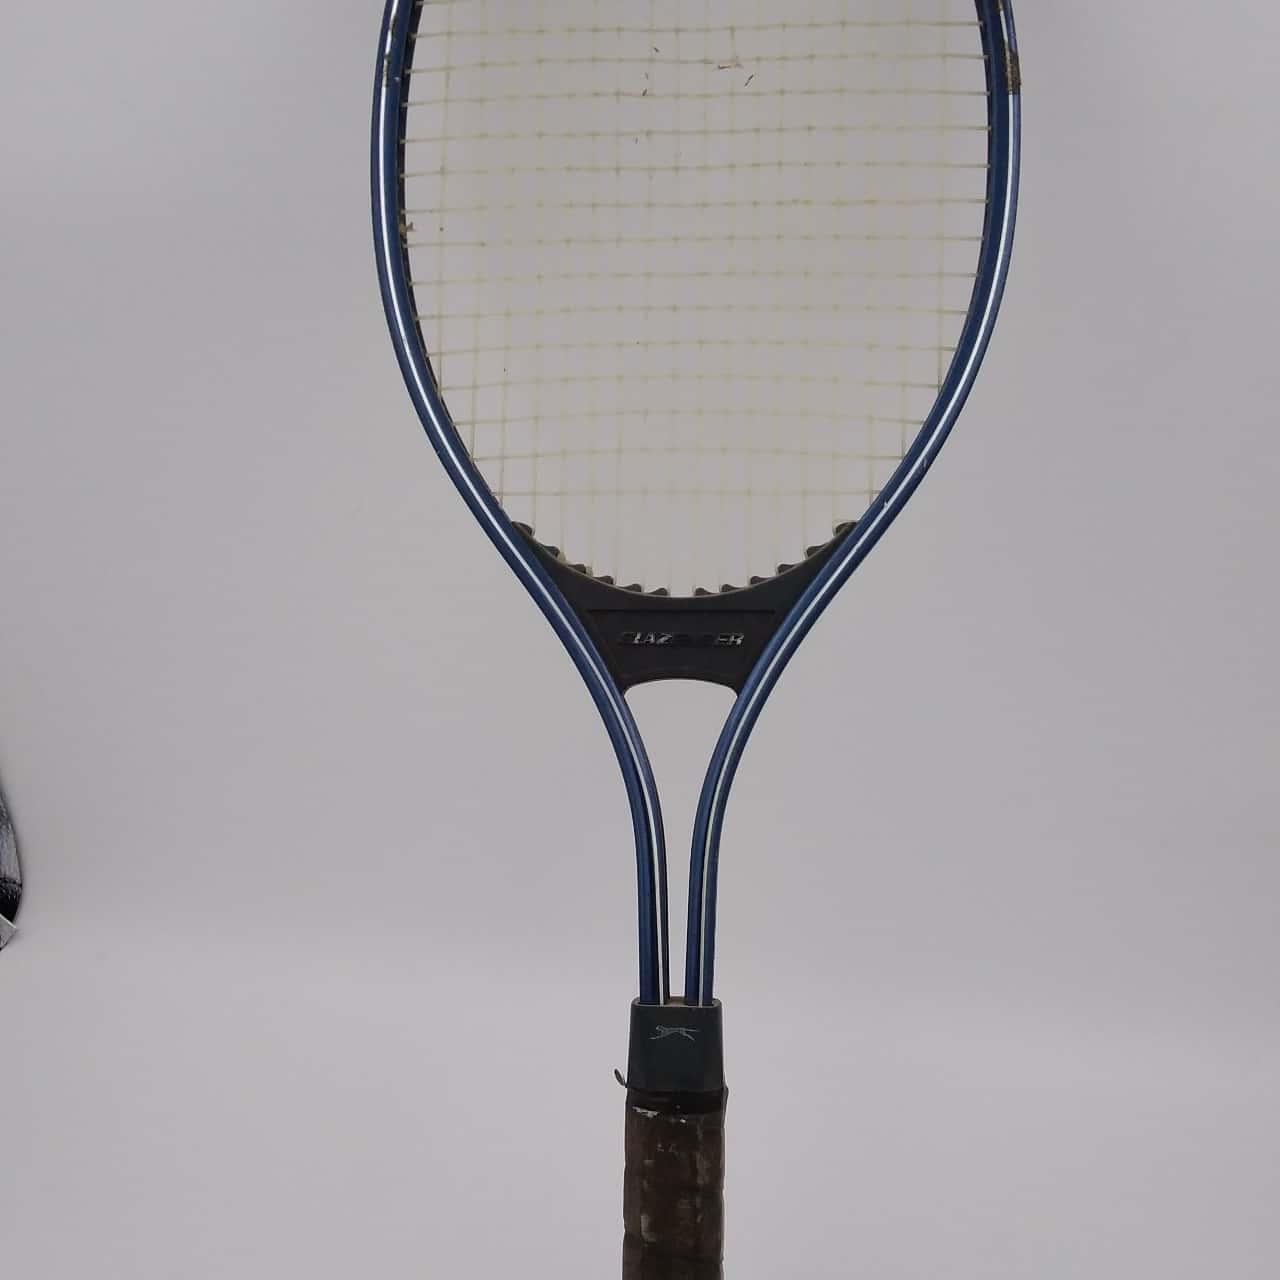 Slazenger Tennis Raquet